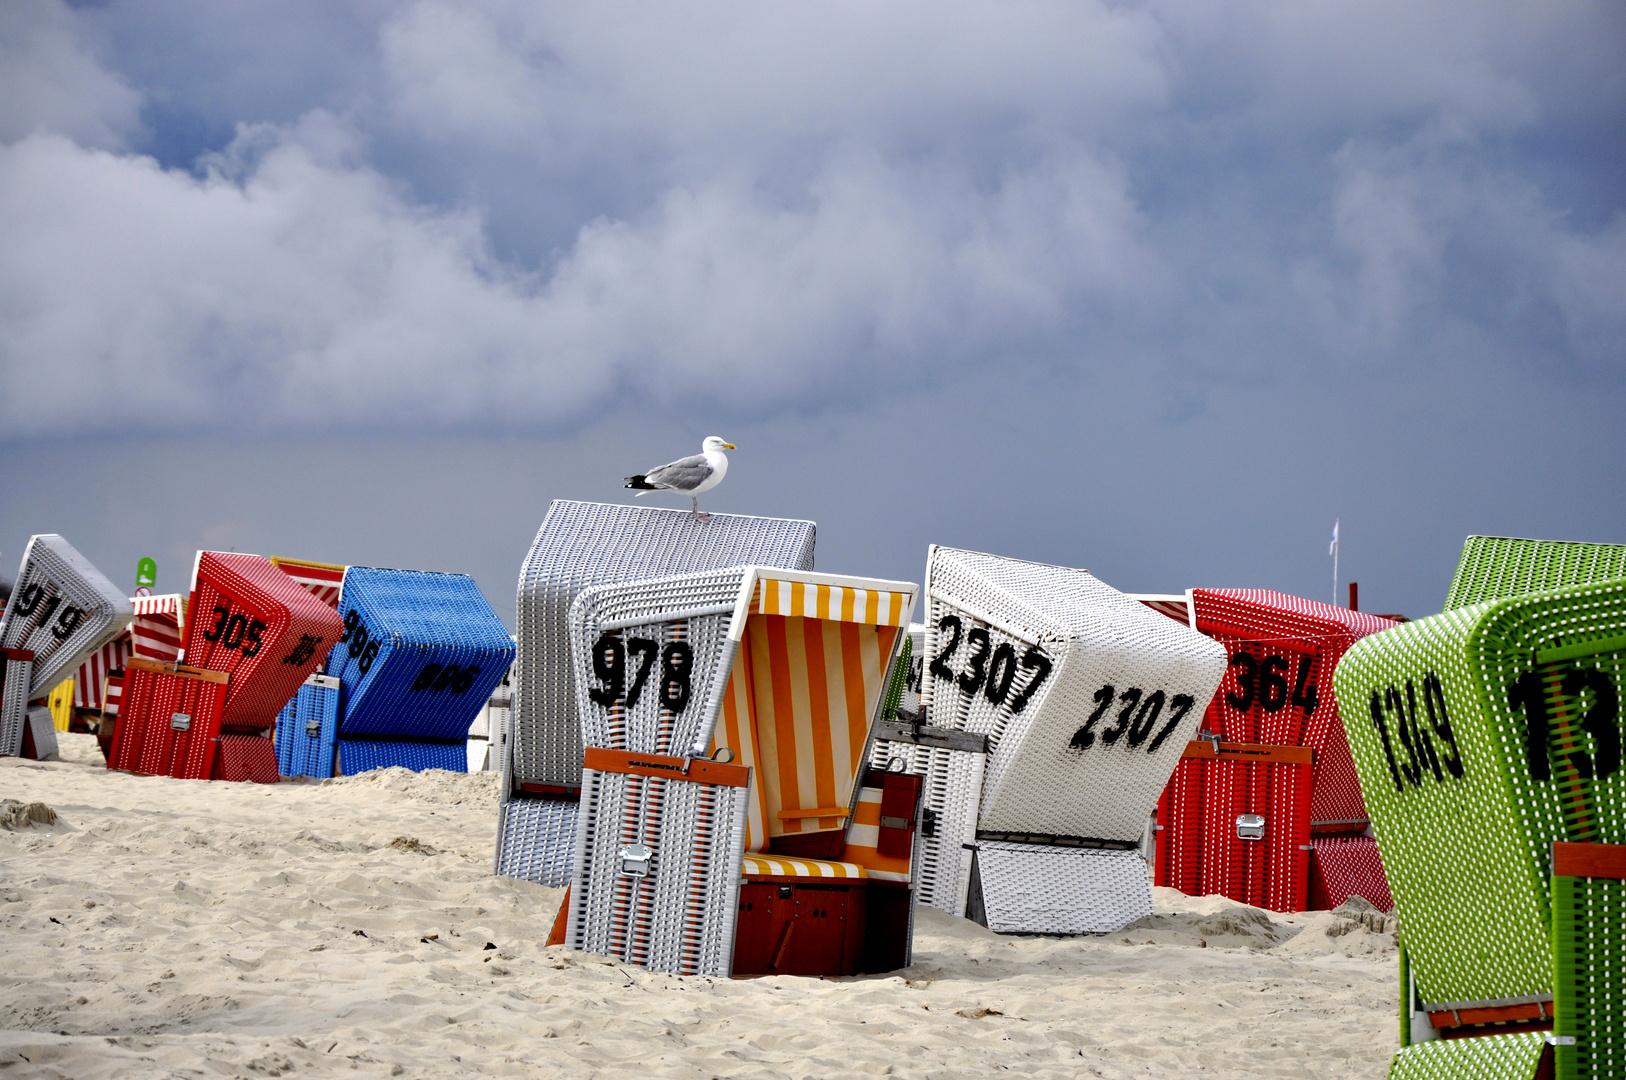 langeoog ~ möwe auf dem strandkorb